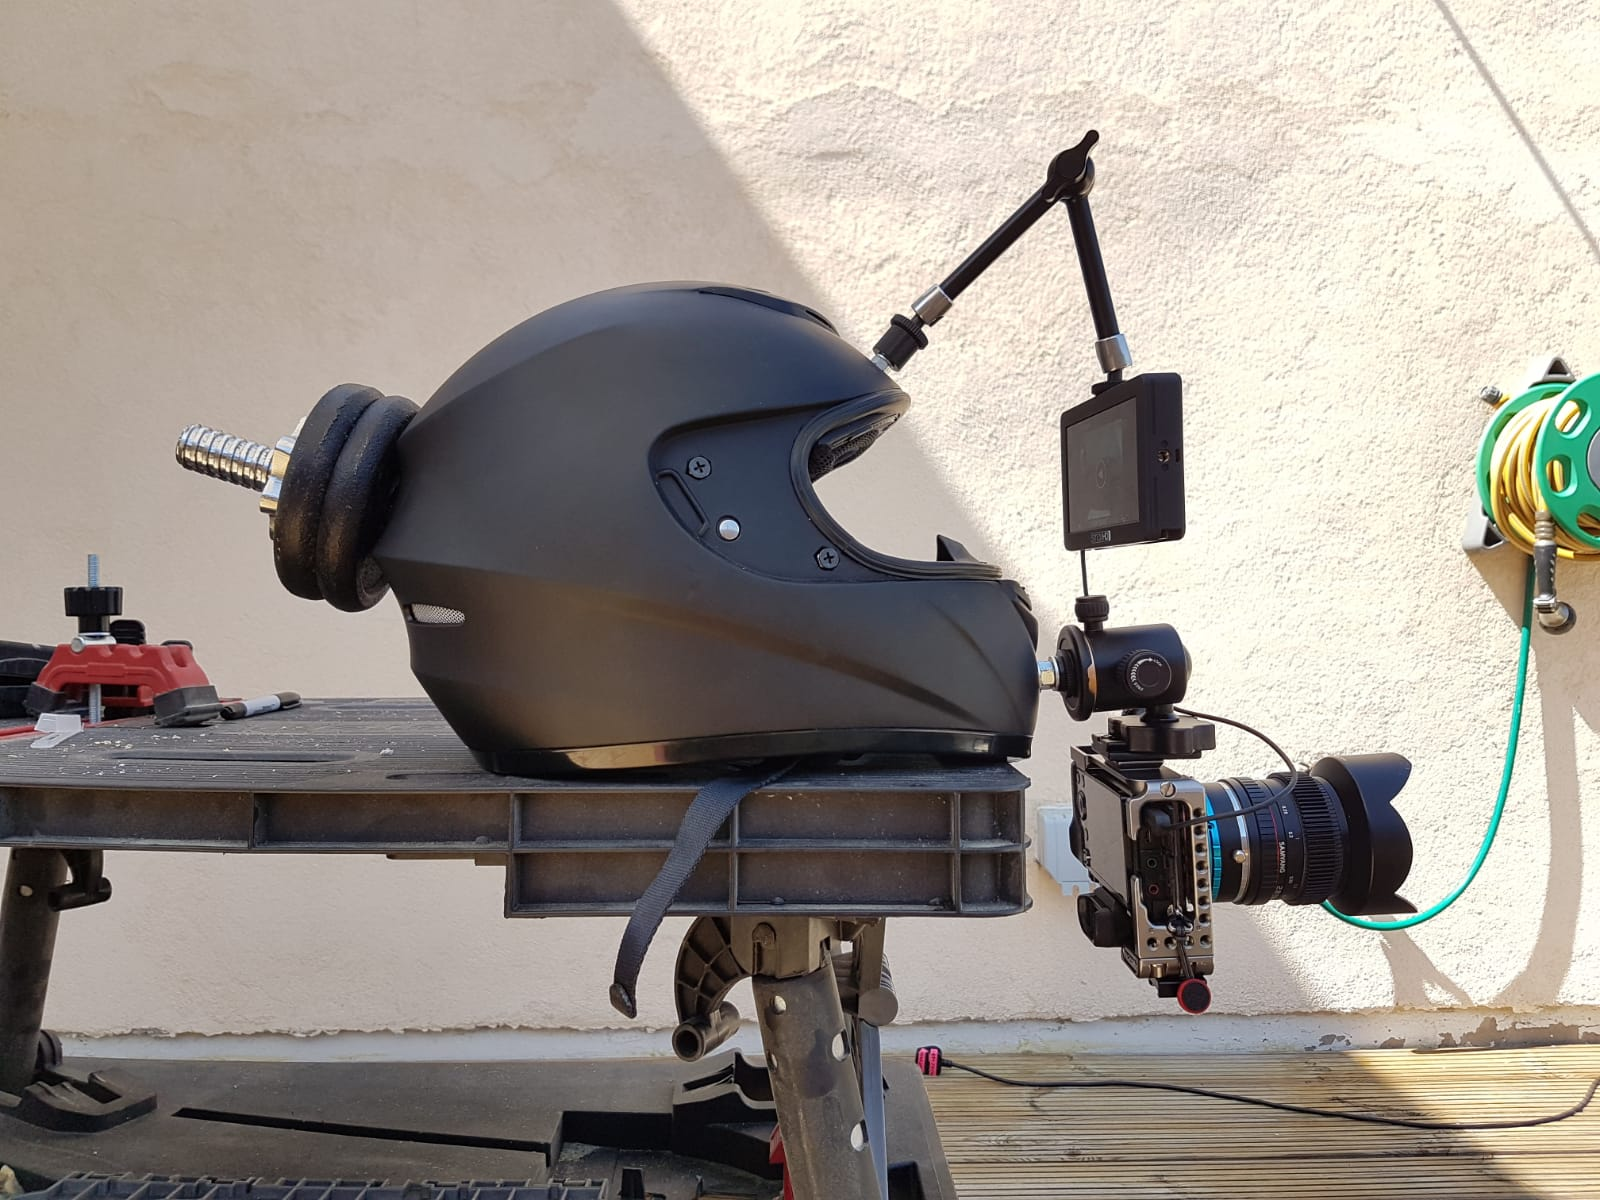 Matt Lesniewski's Helmet Cam invention